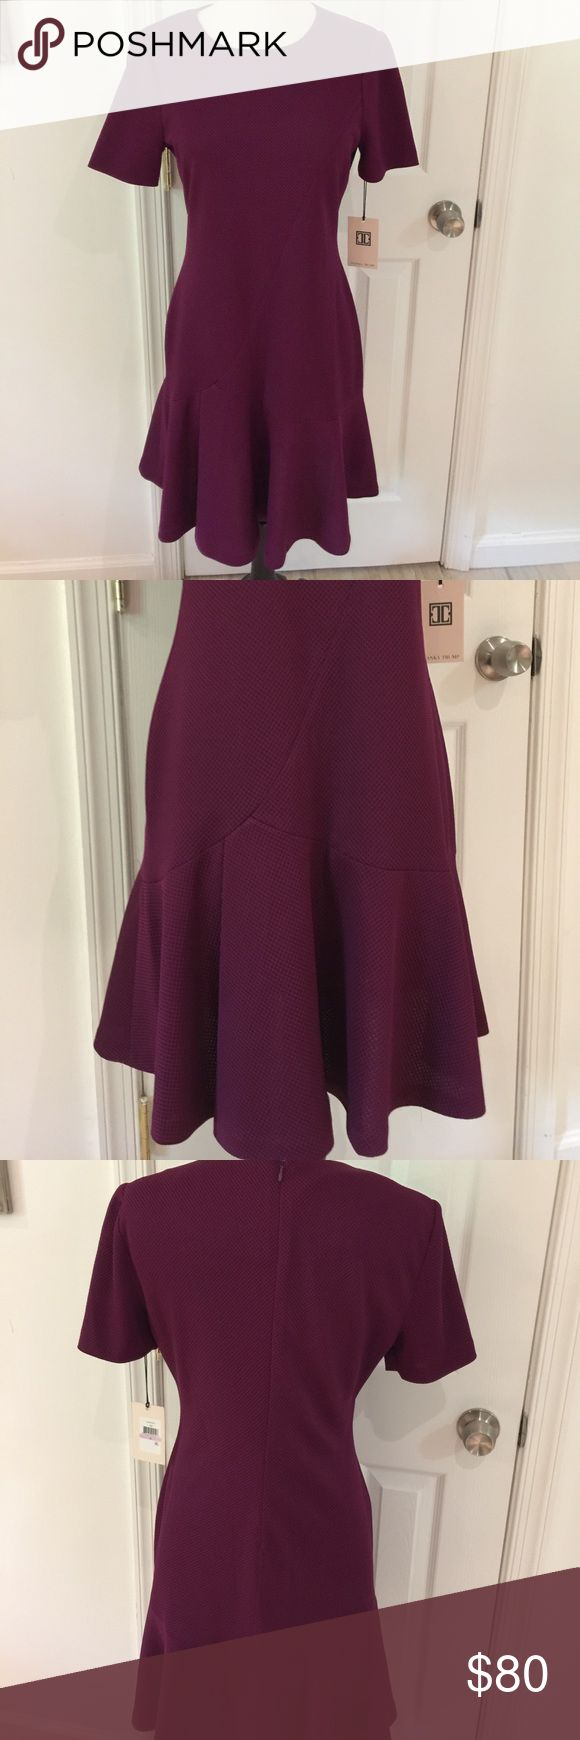 New with tags Ivanka Trump dress Gorgeous Ivanka dress ! Lovely details on bottom of dress. Flattering fit. Ivanka Trump Dresses